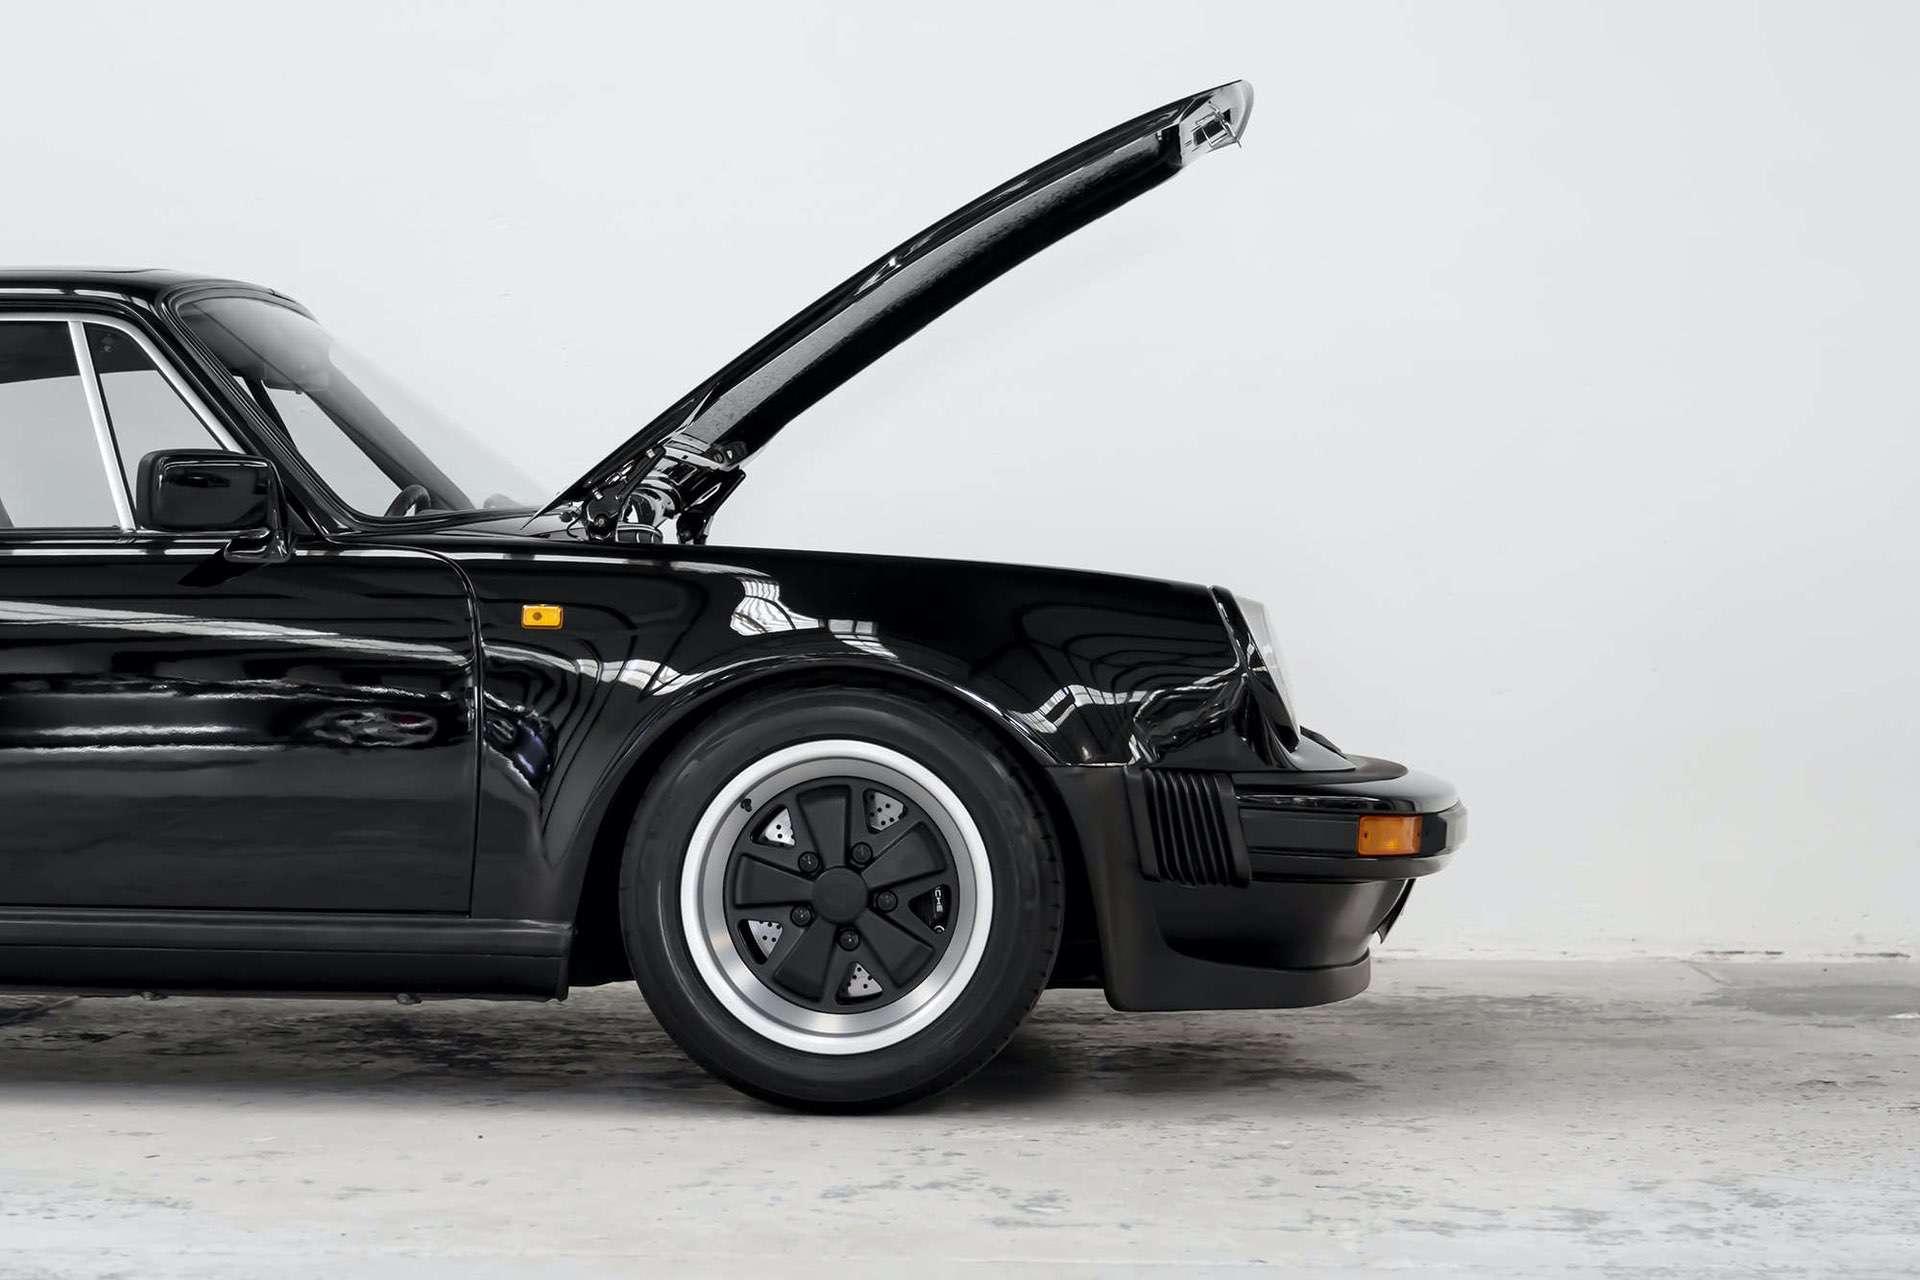 Porsche_911_930_Turbo_0022